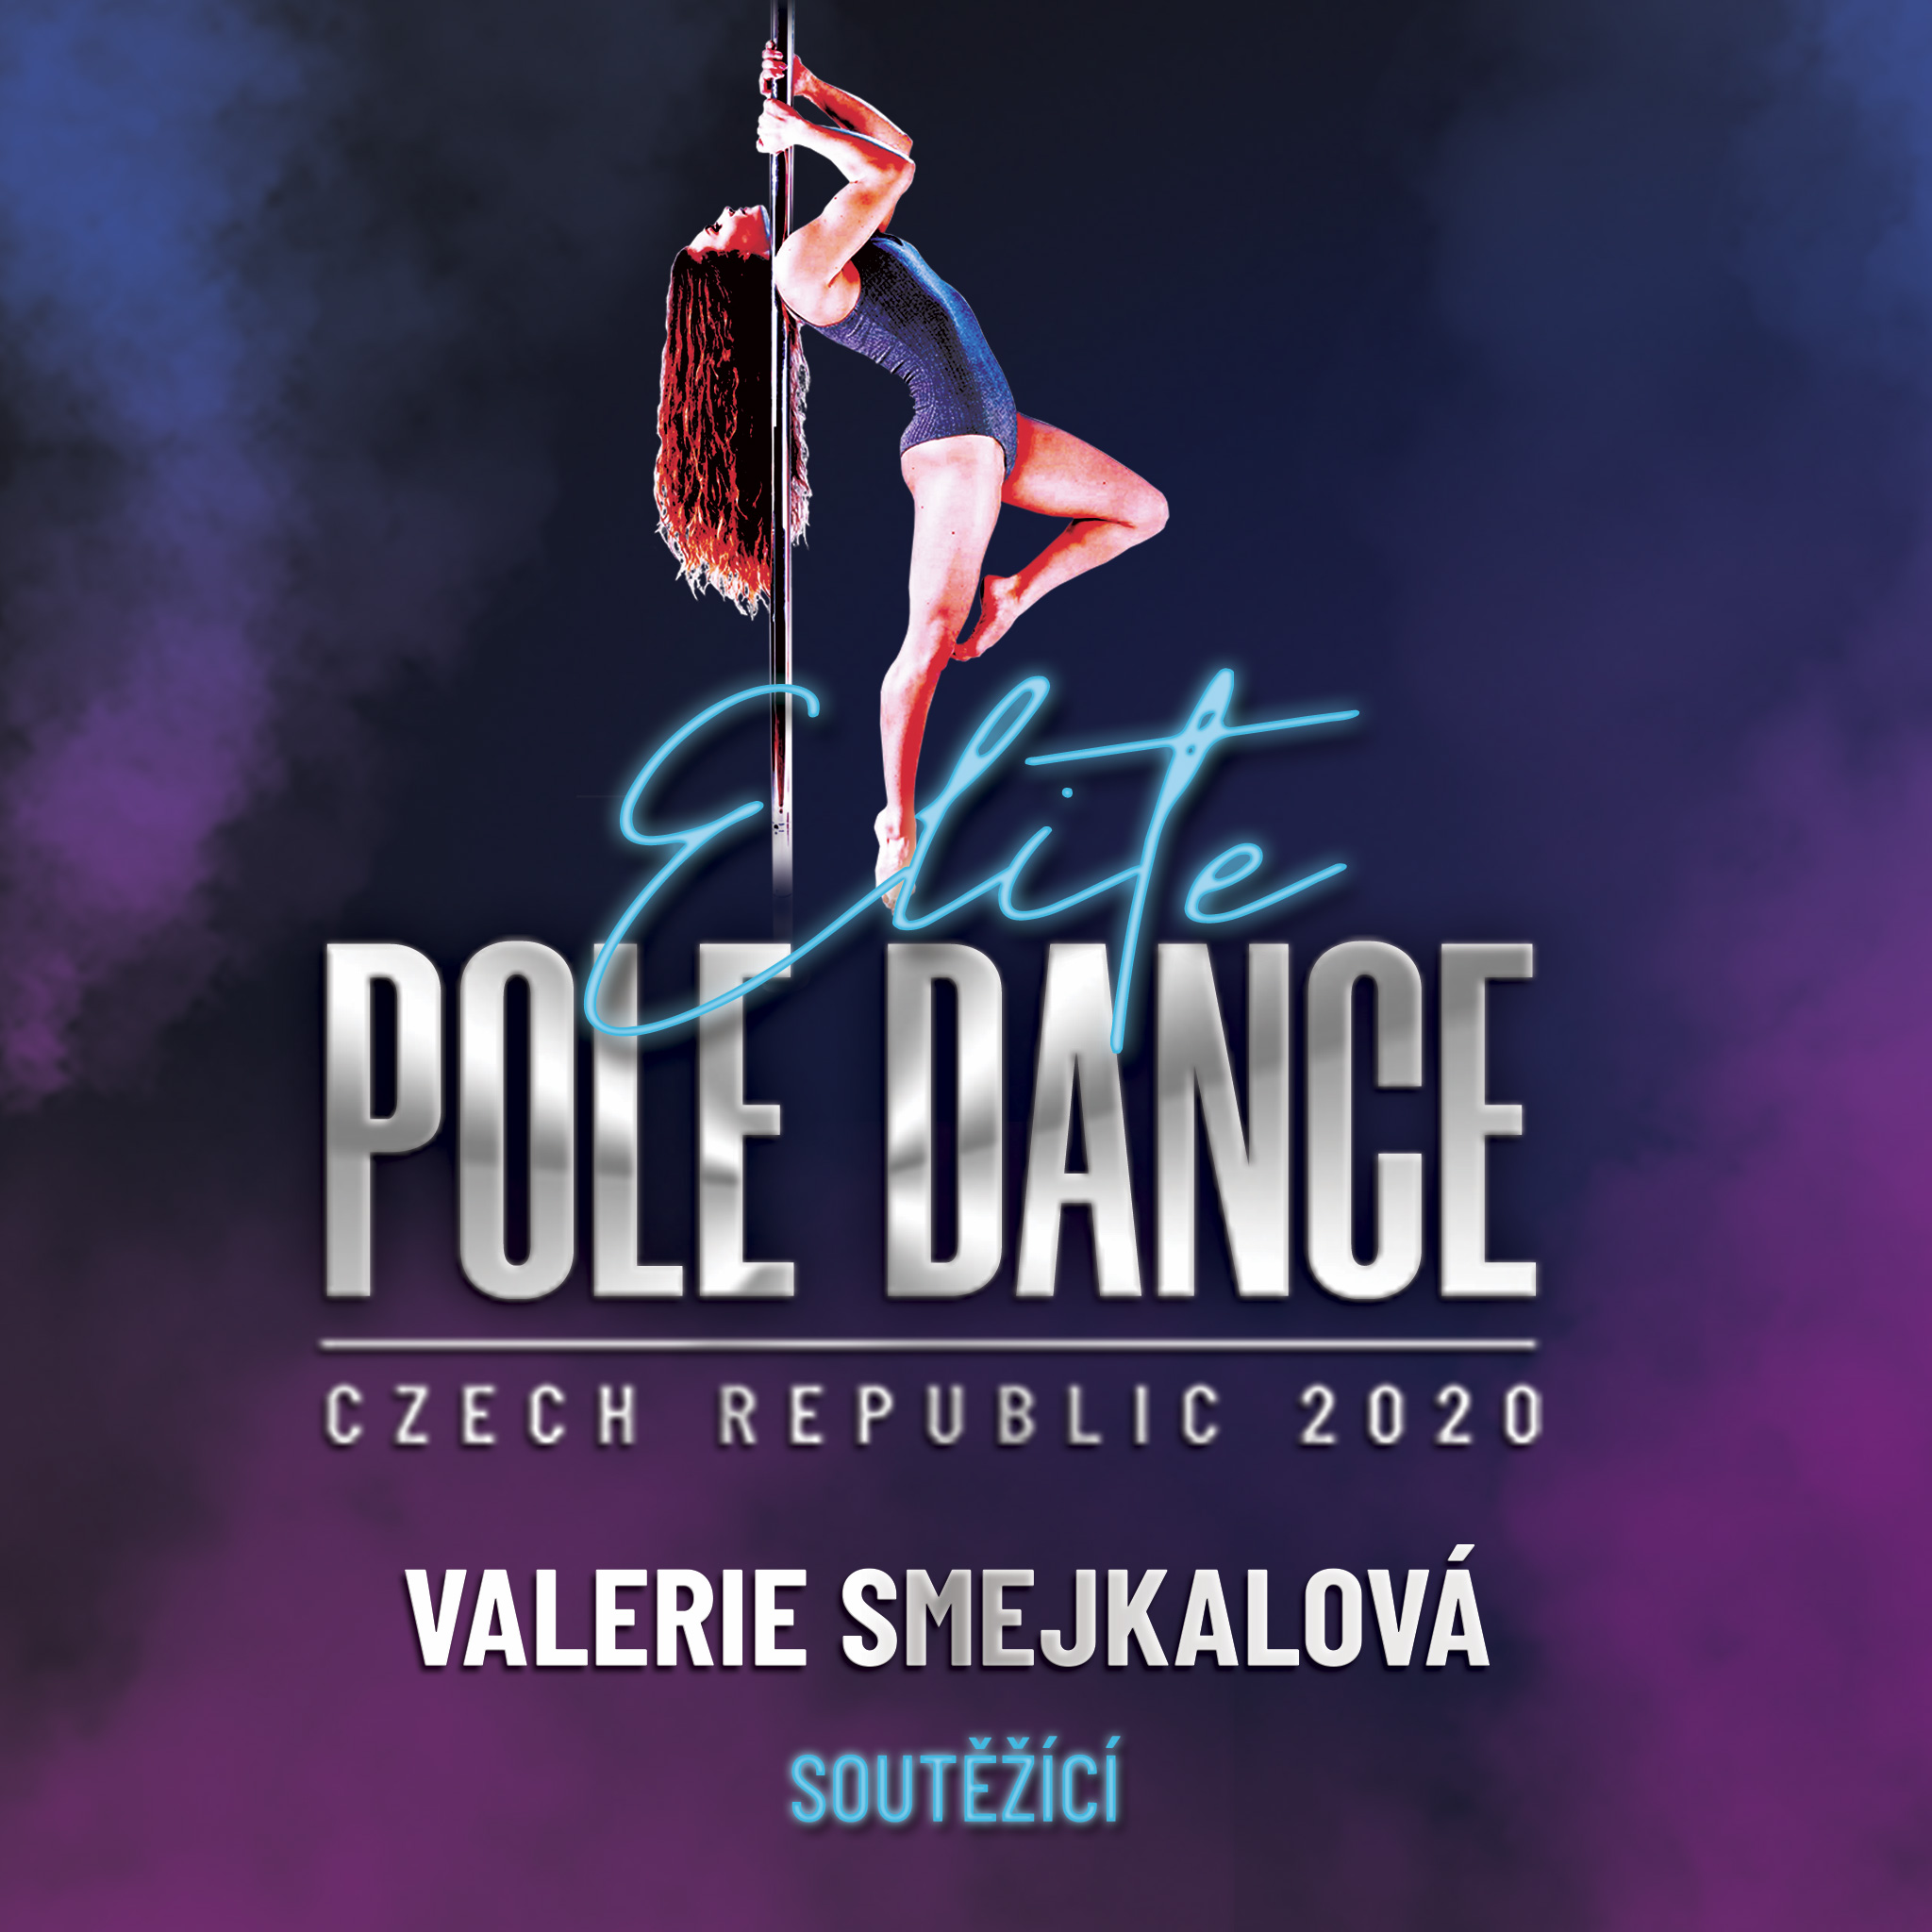 Valerie Smejkalová Elite Pole Dance ČR